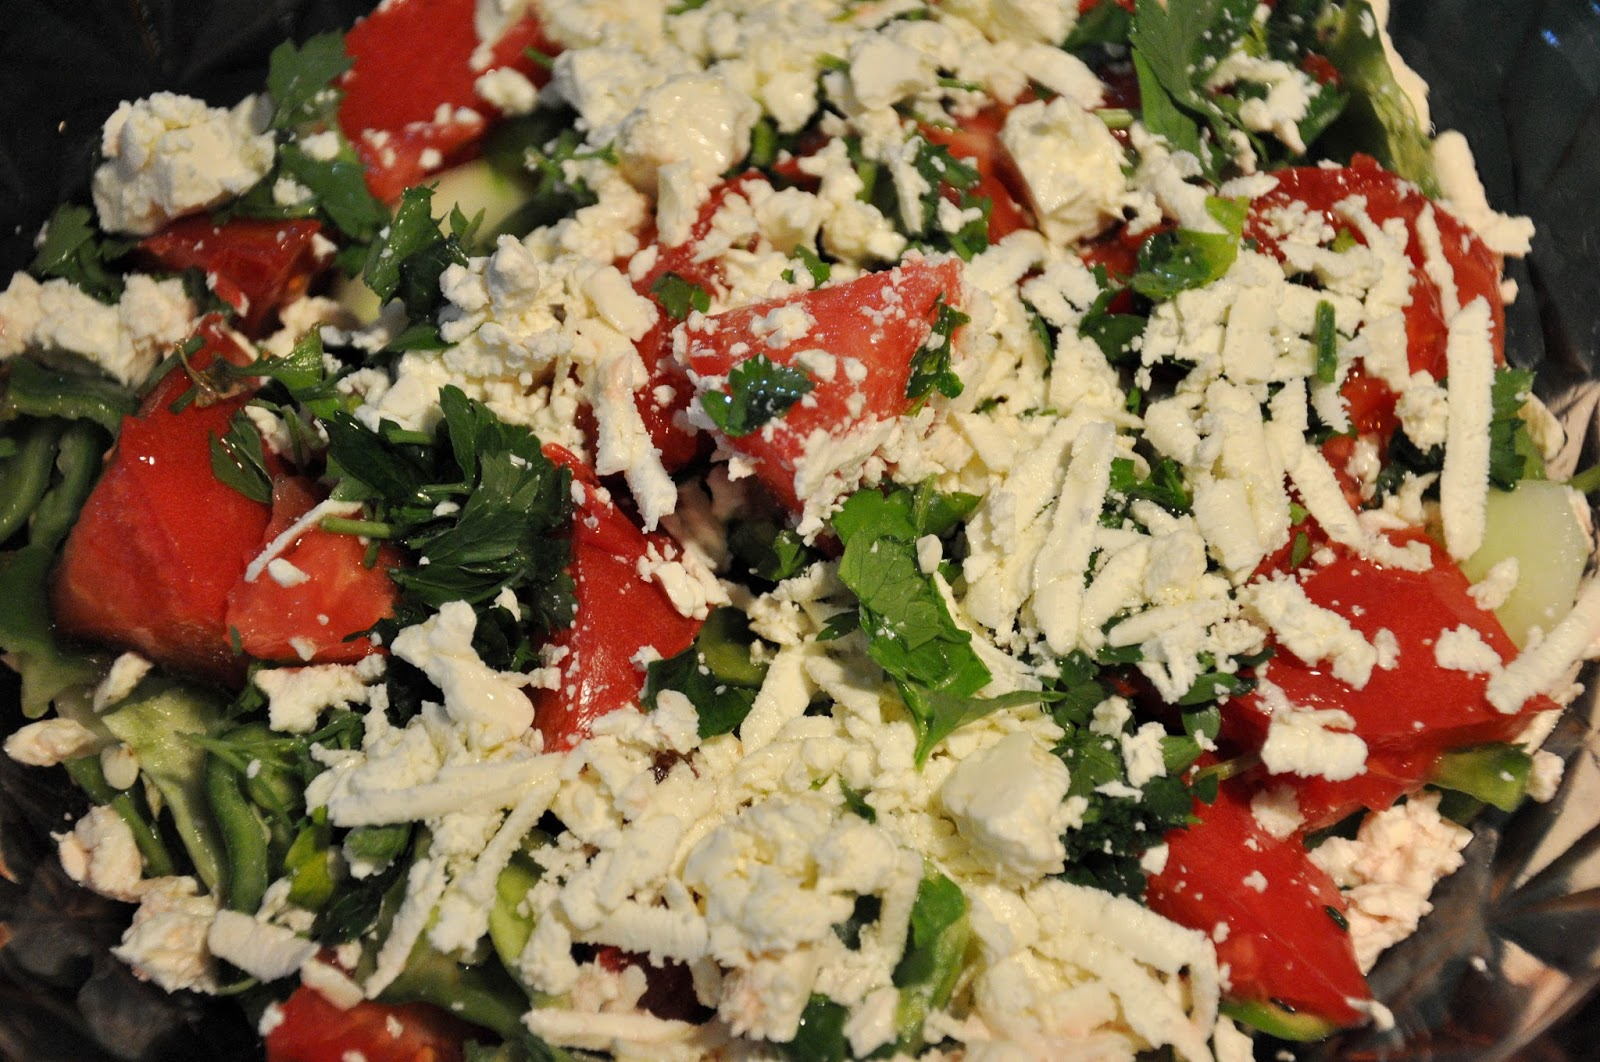 Bulgarian Shopska salad - Шопска салата